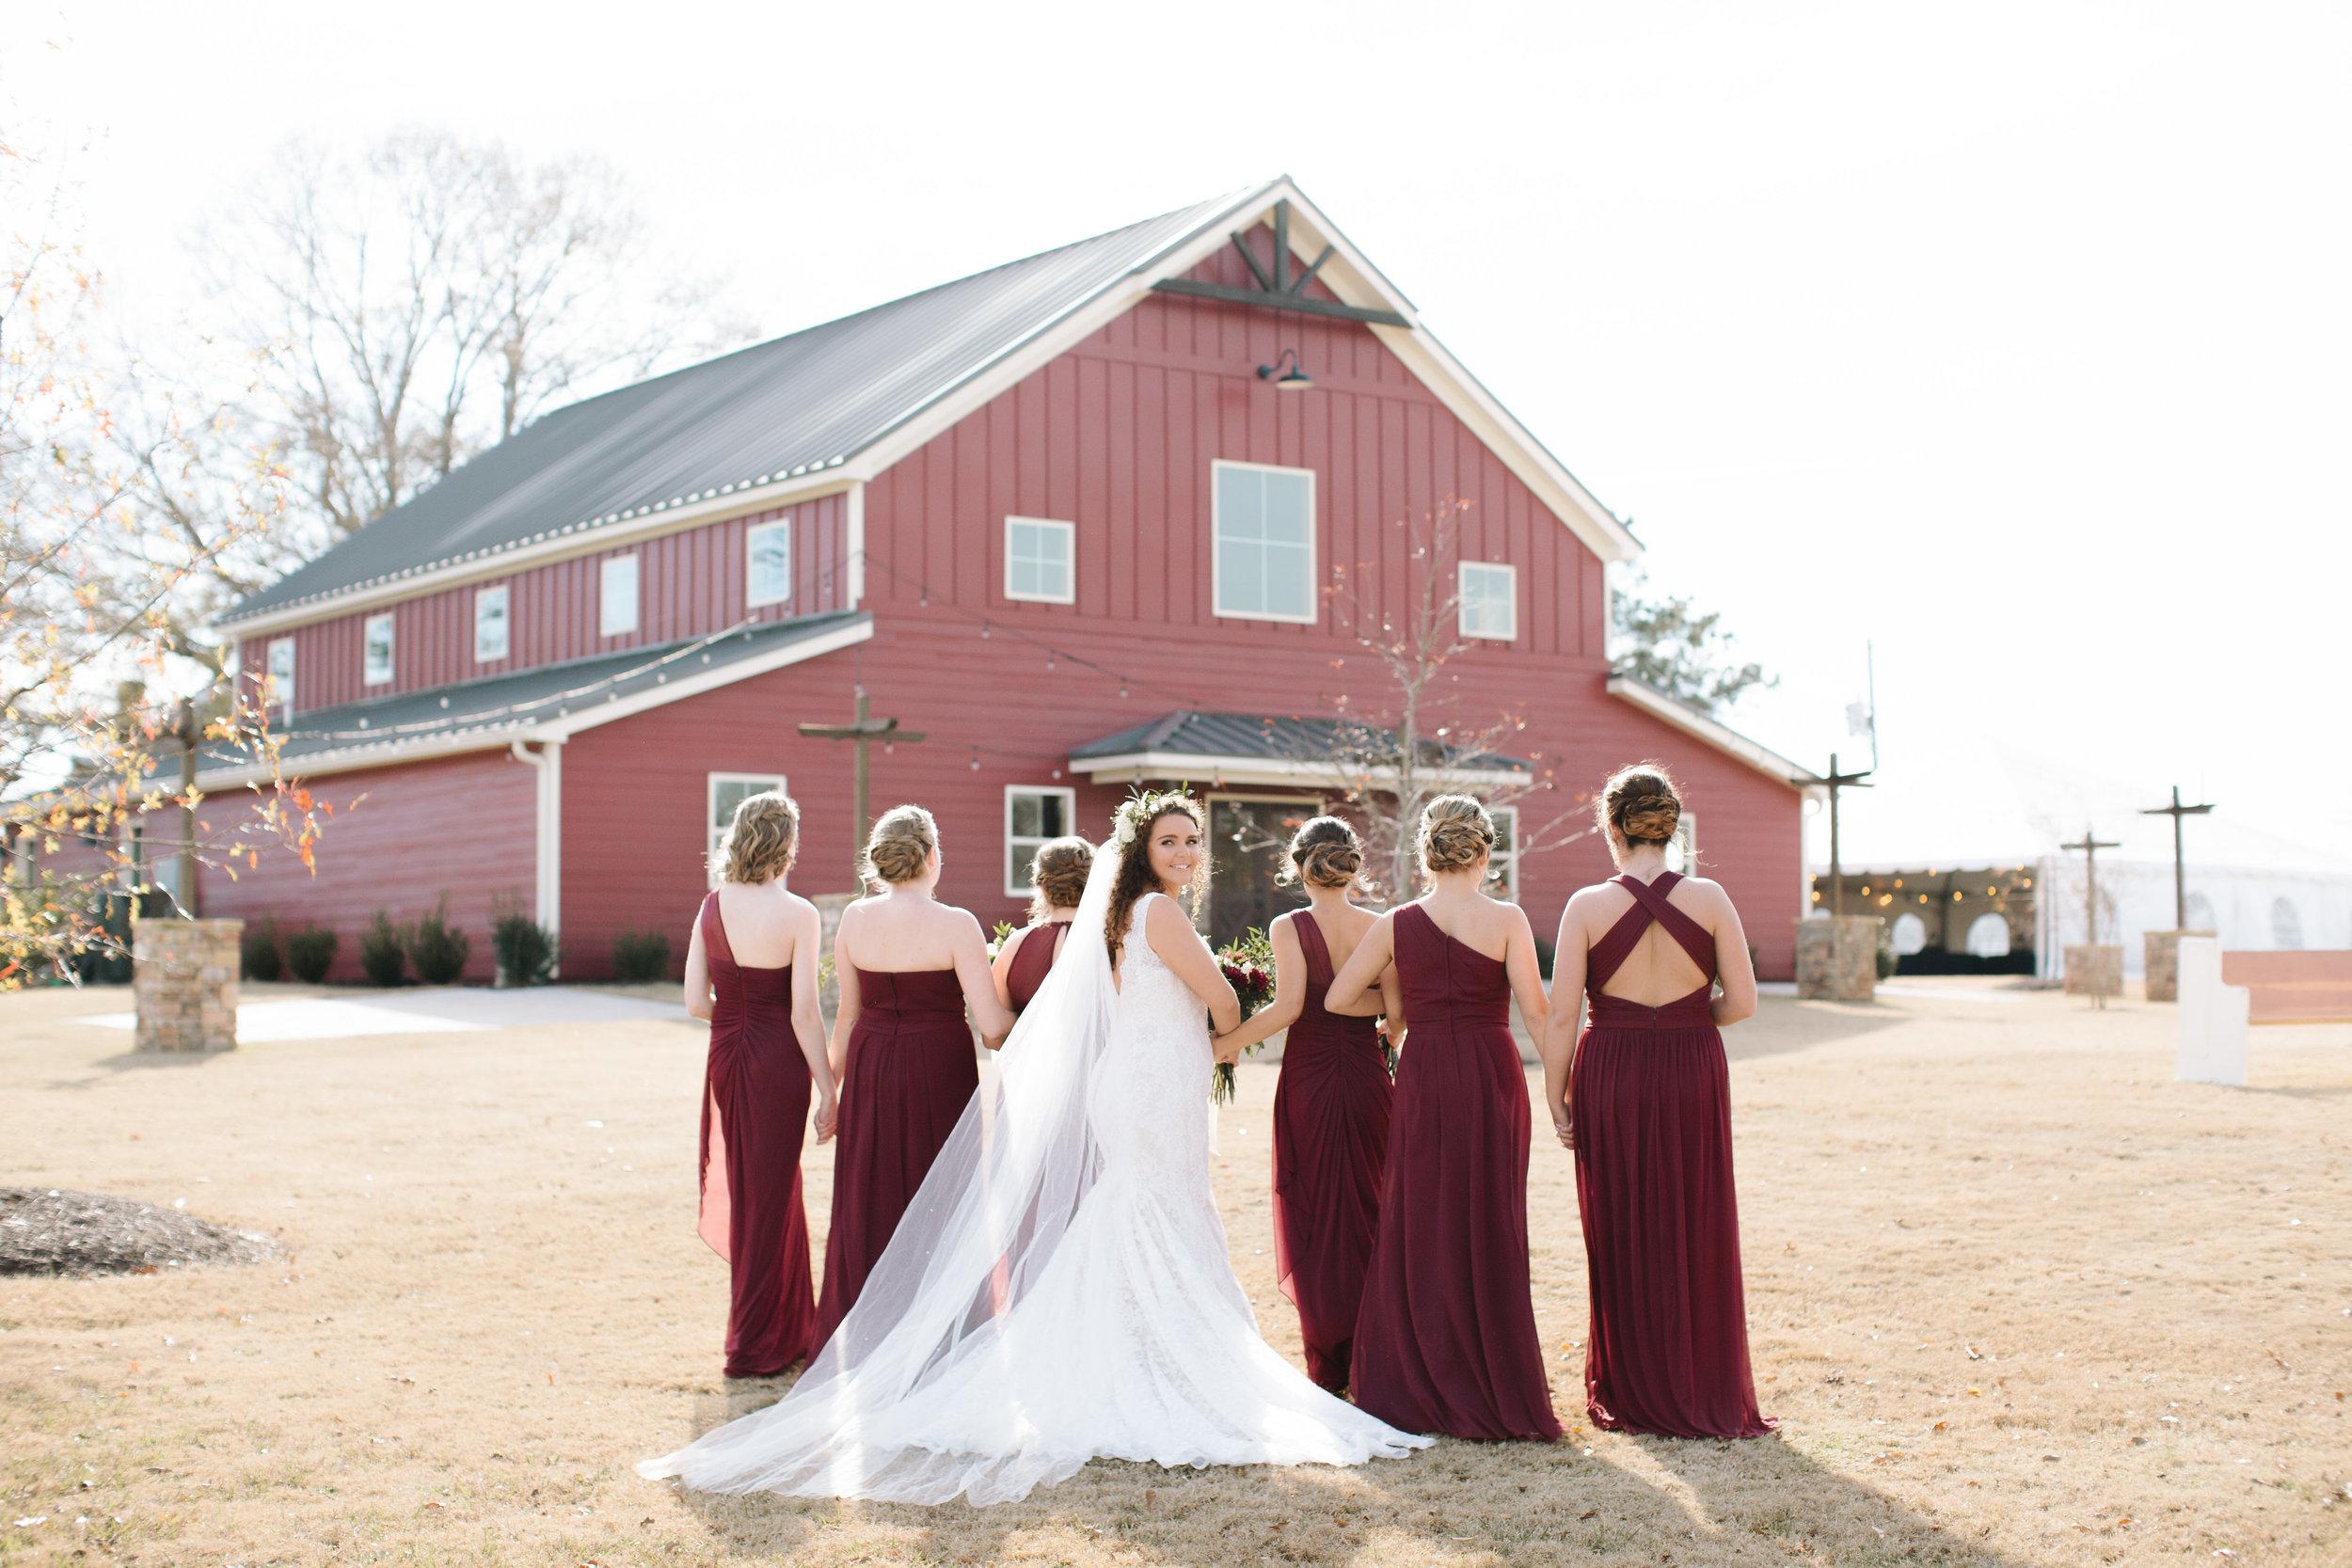 Photo by Megan Hobbs Photography. Wedding on December 16, 2017